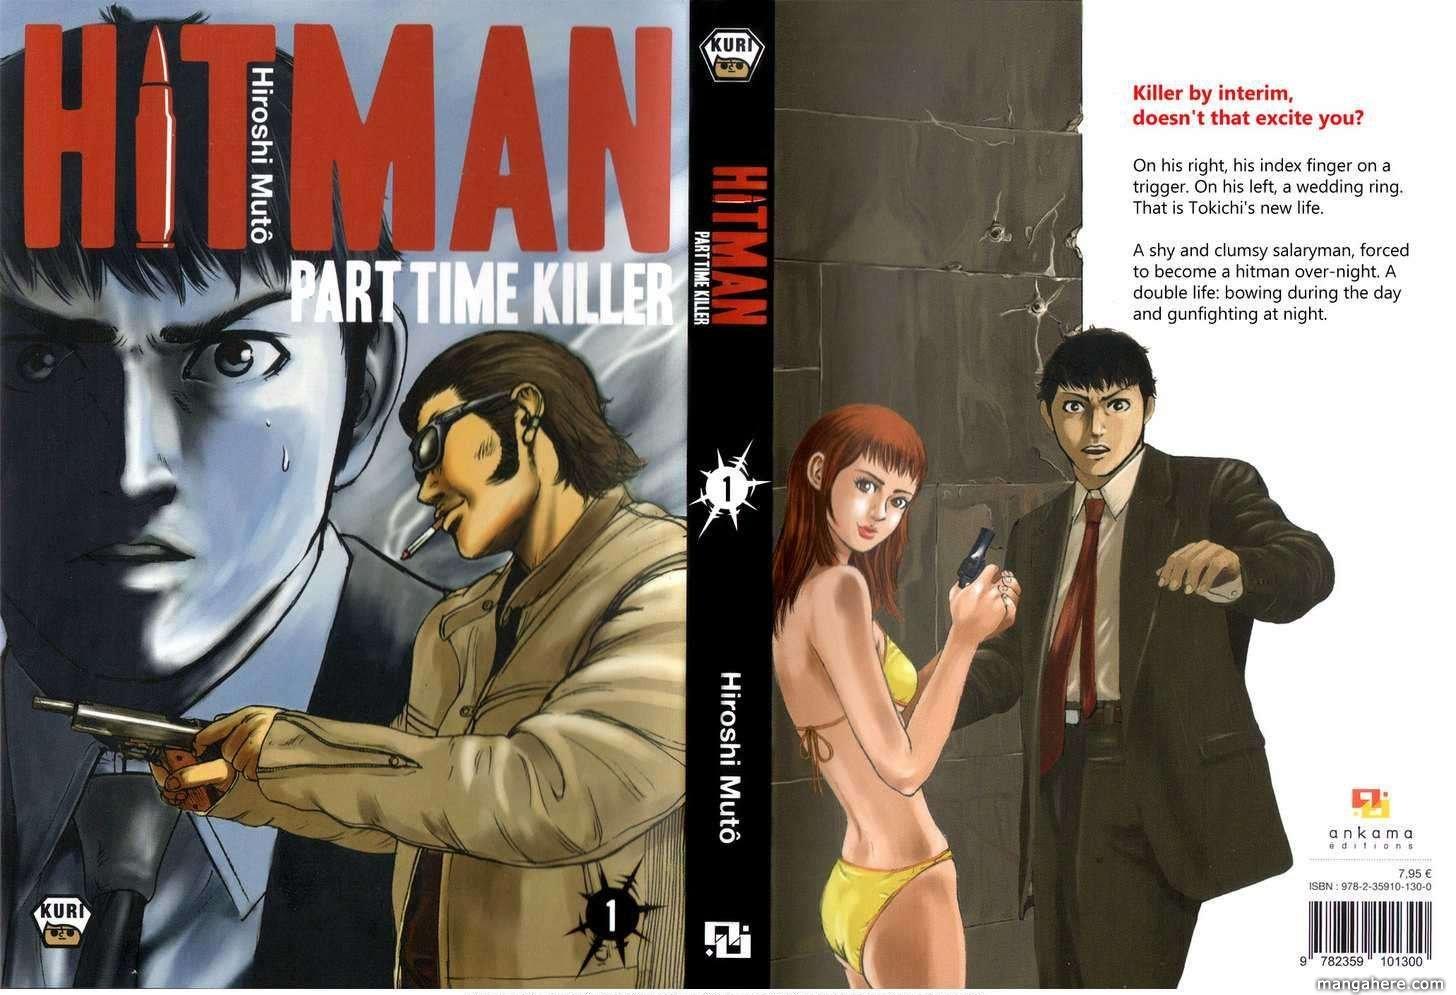 Kyou Kara Hitman 1 Page 2